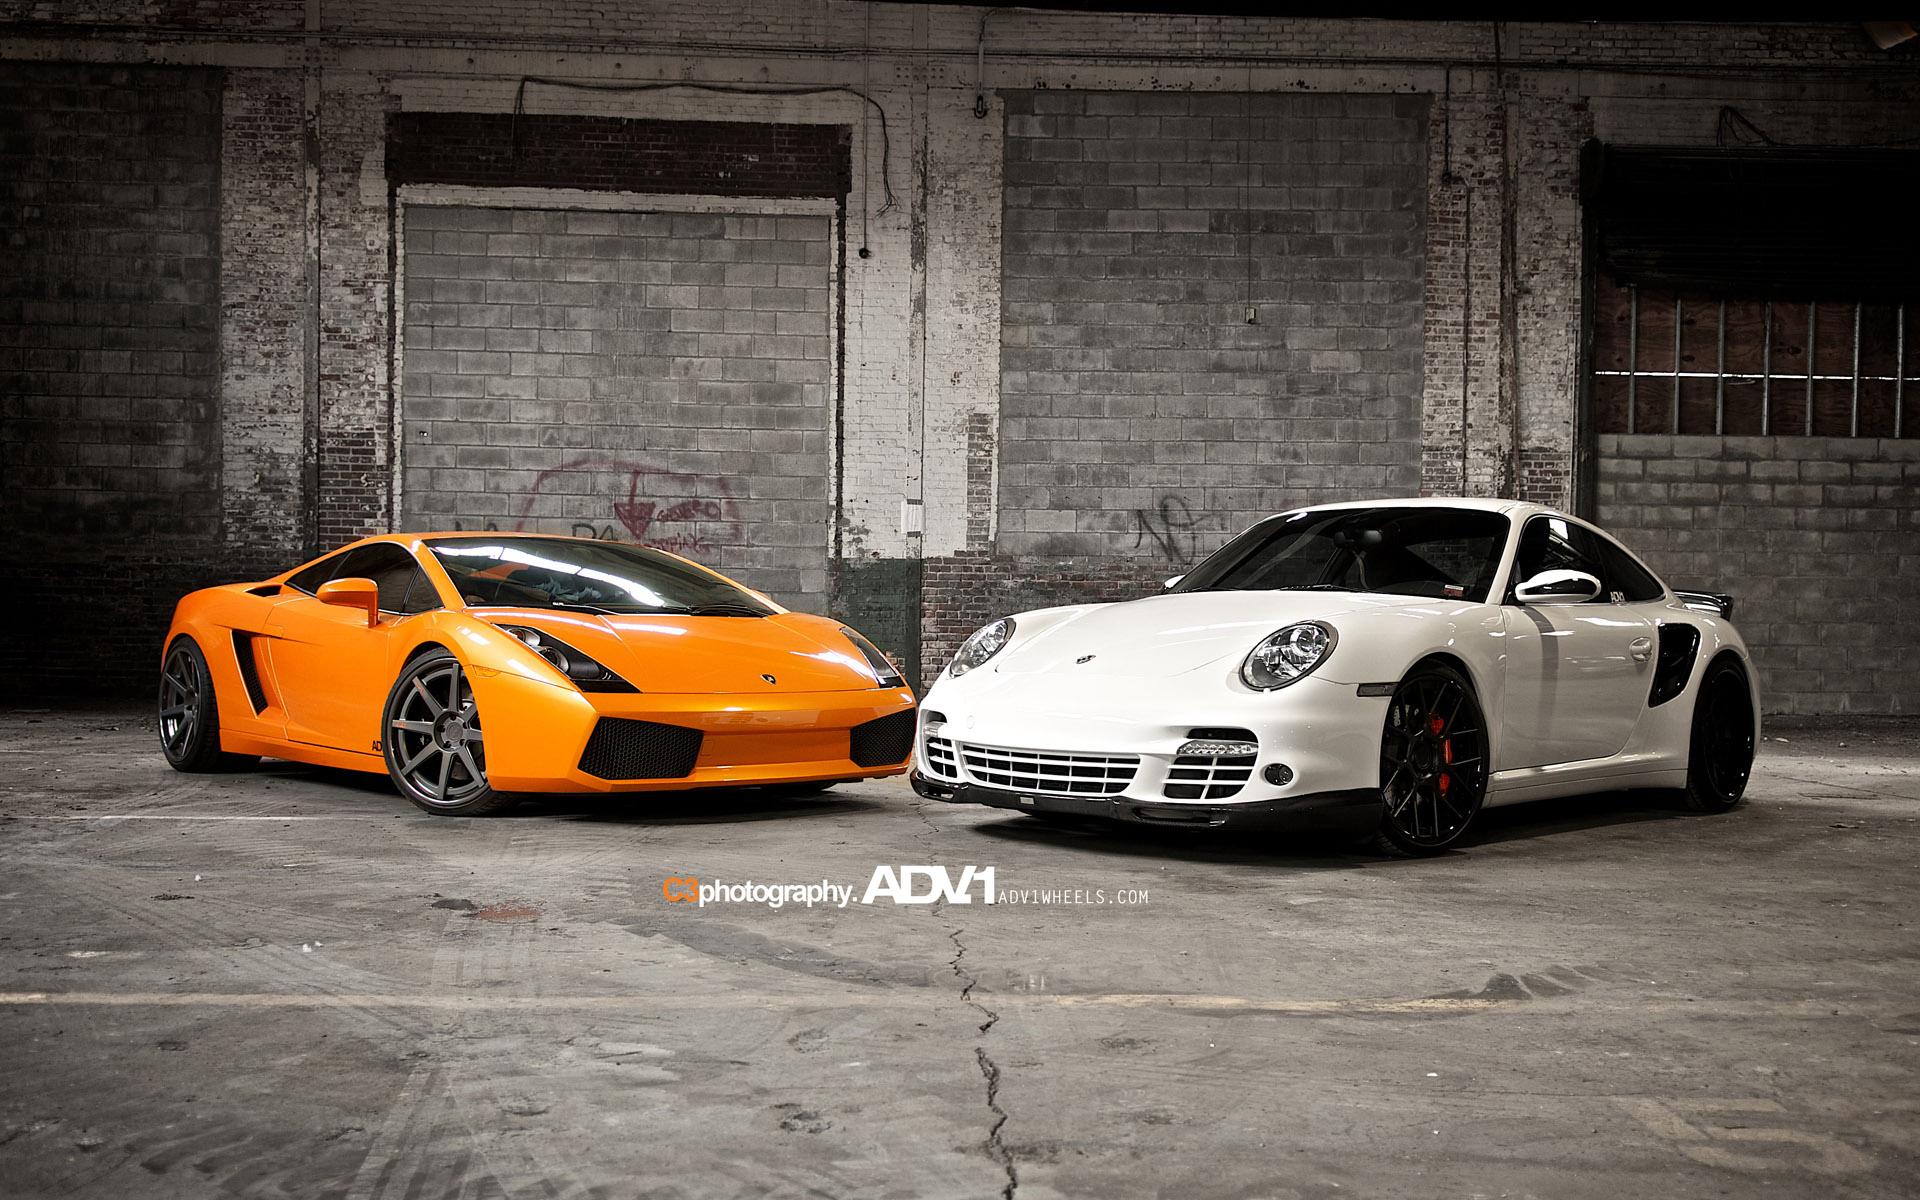 Lamborghini Gallardo And Porsche 997 TT